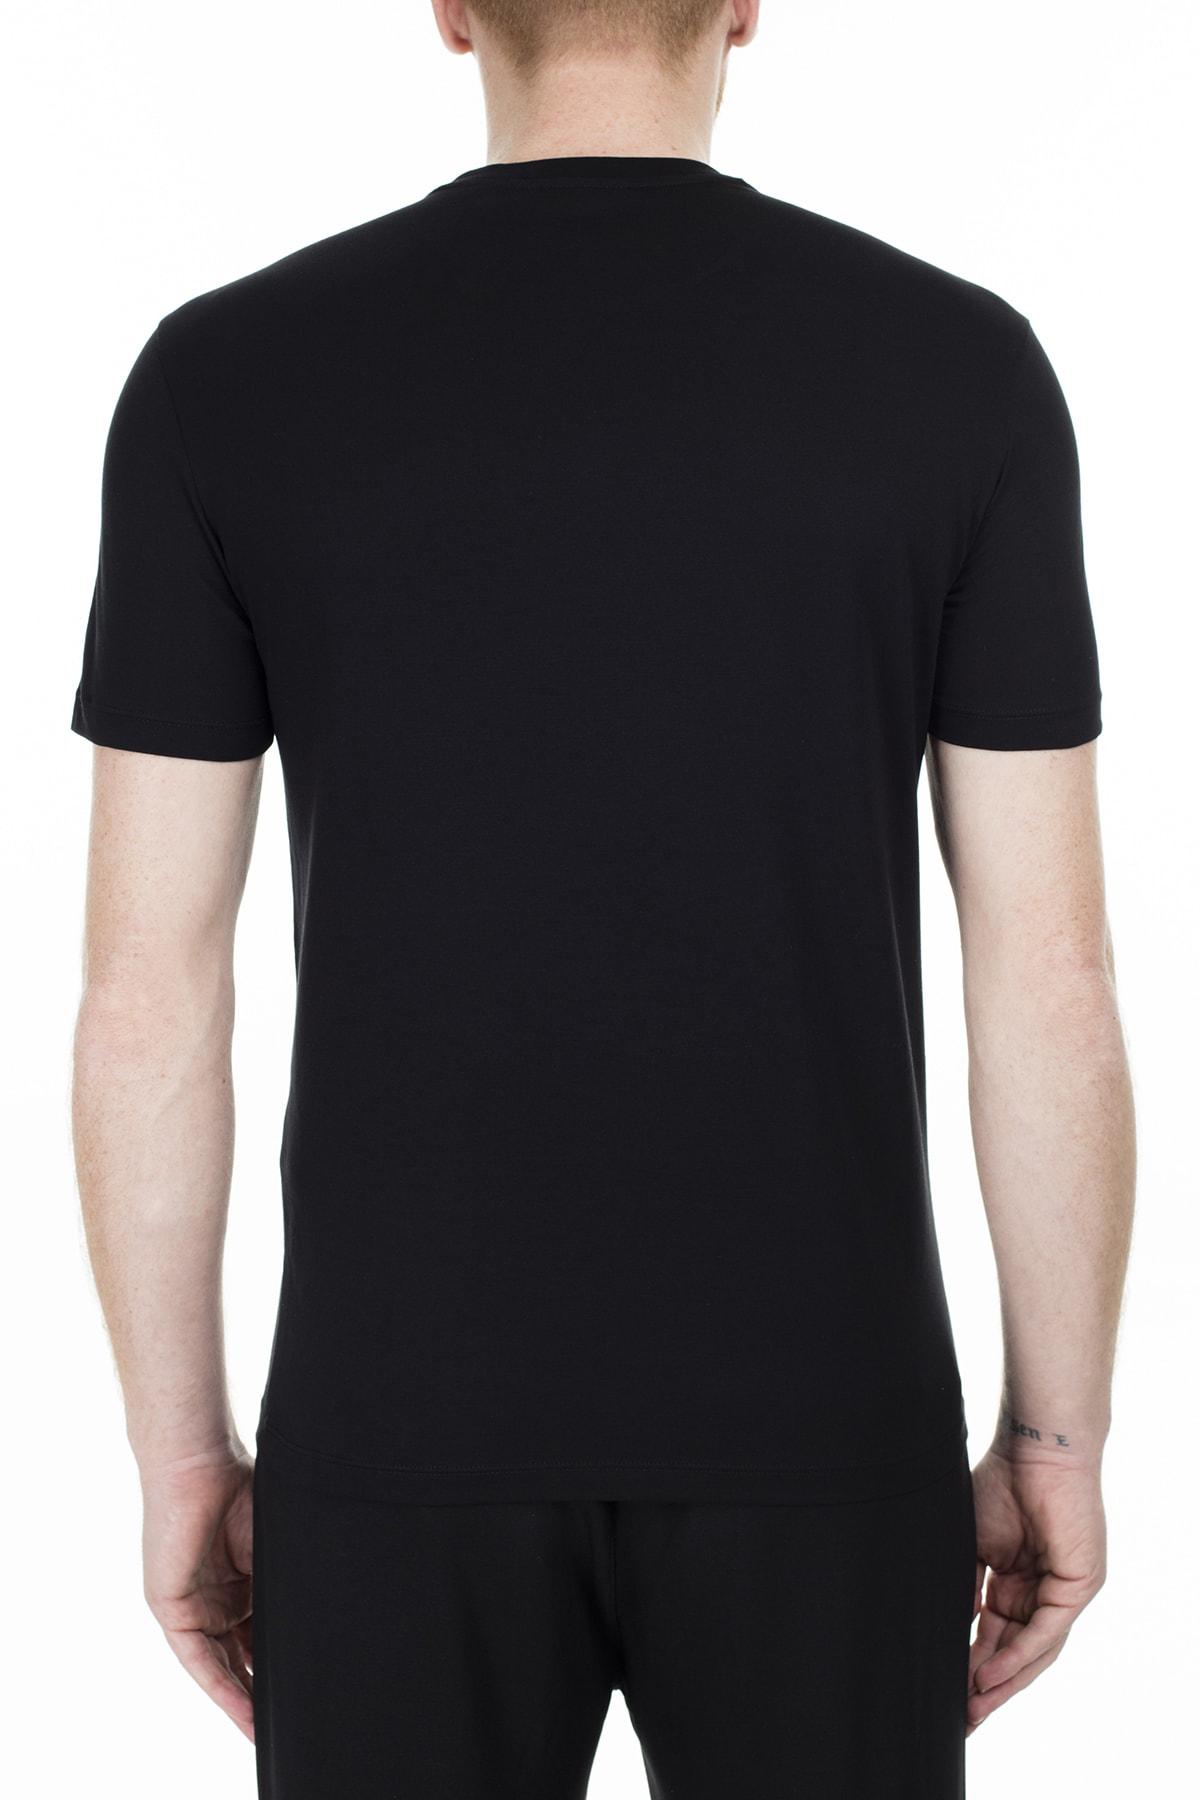 Emporio Armani T Shirt Erkek T Shirt S 6G1Te7 1Jnqz 0999 S 6G1TE7 1JNQZ 0999 1